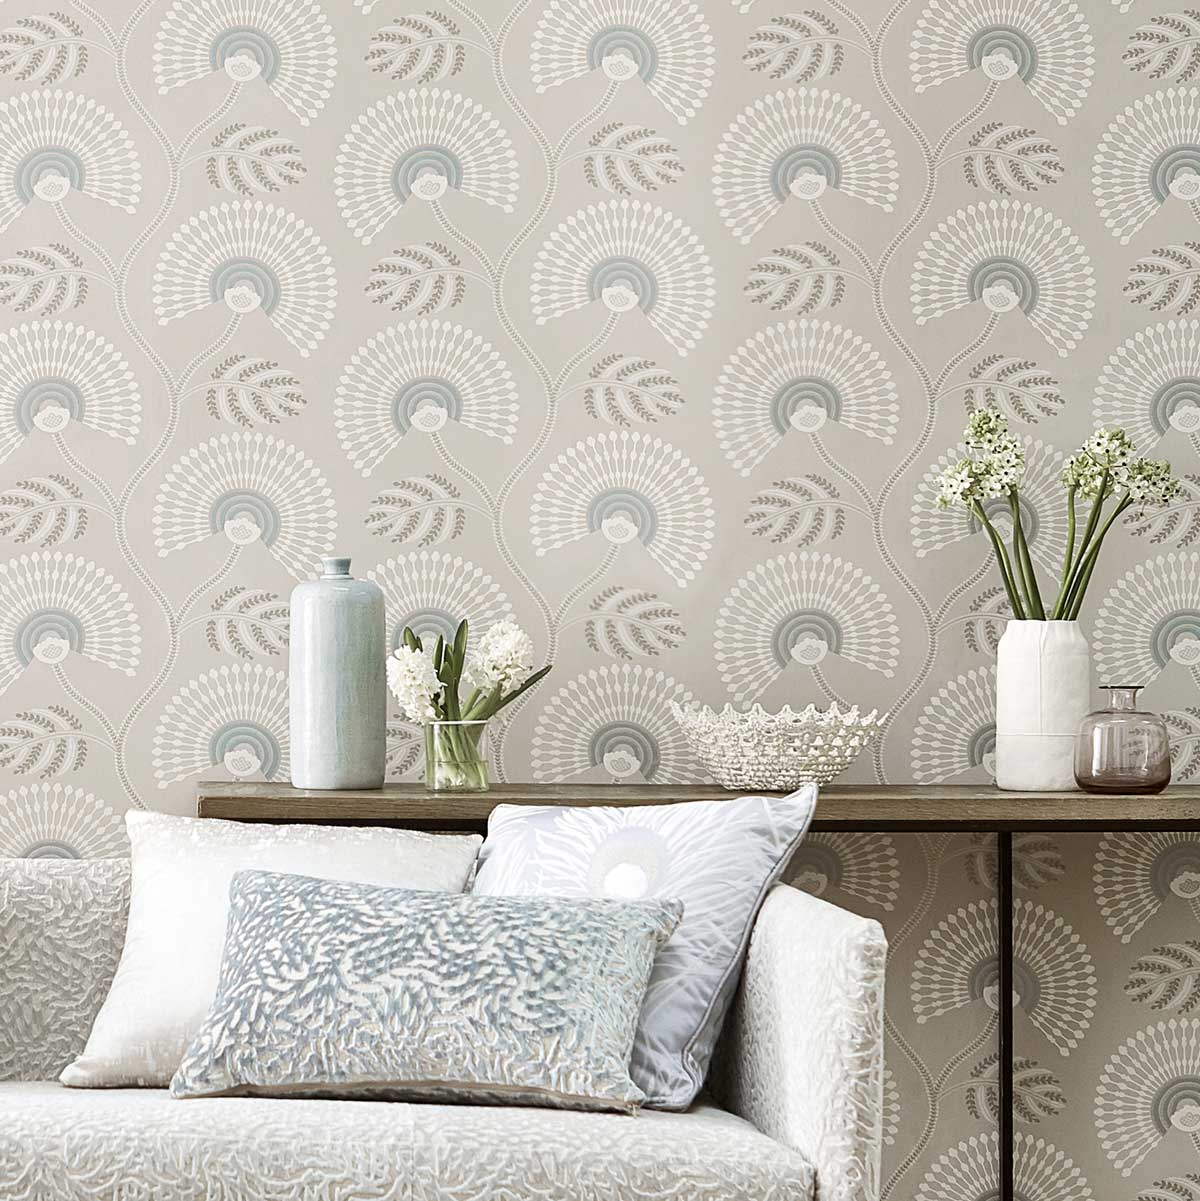 Louella Wallpaper - Seaglass/Pearl - by Harlequin